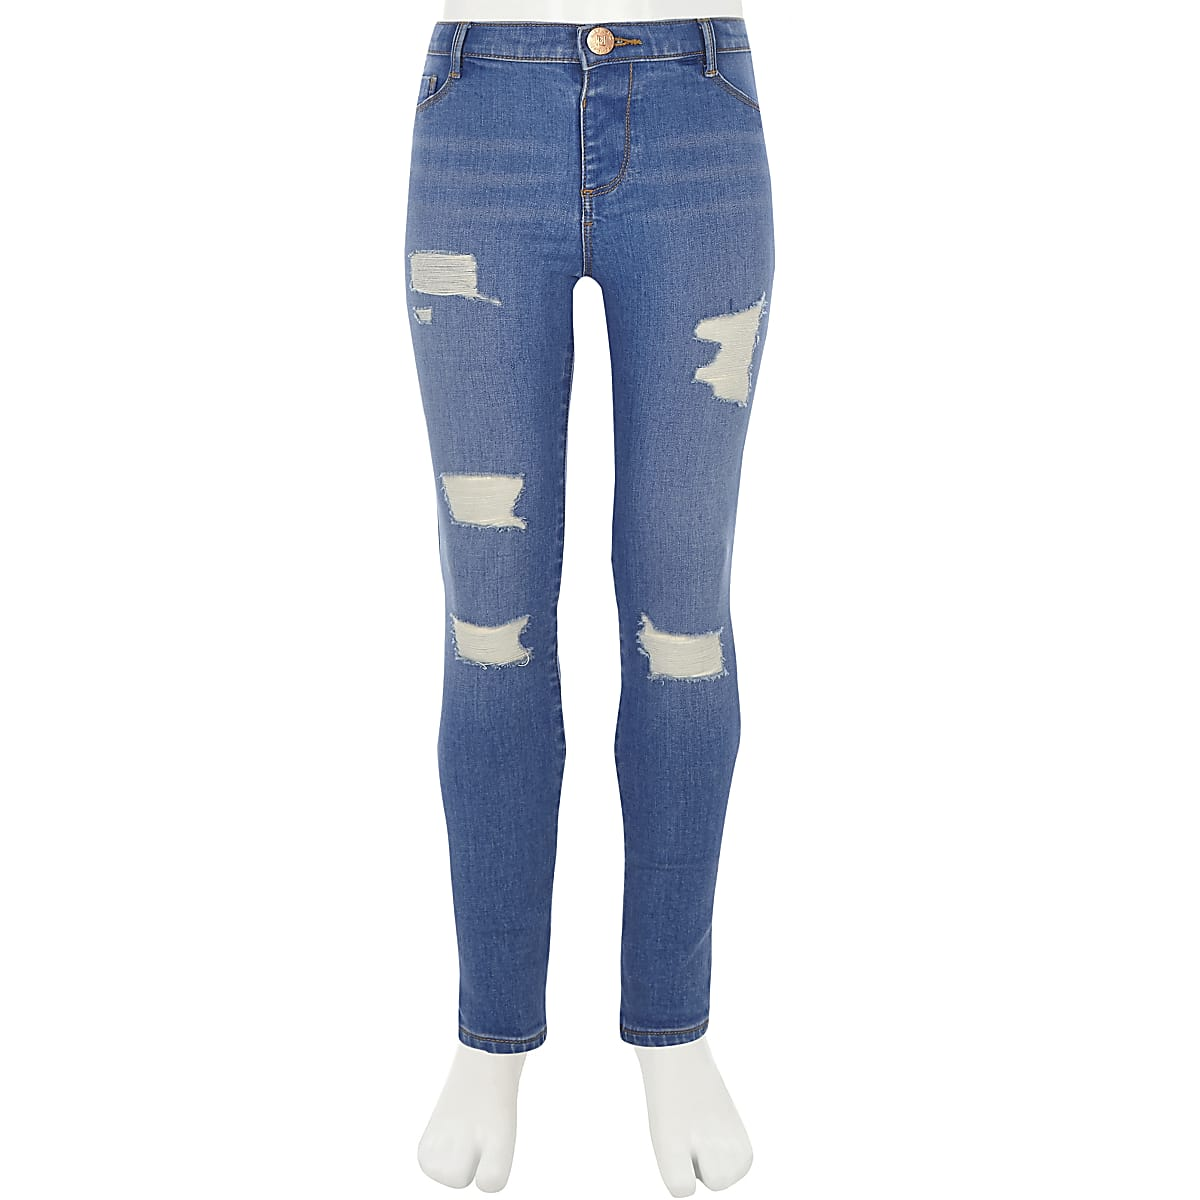 85bb60f3fe4da Girls blue Molly ripped mid rise jeggings - Jeggings - Jeans - girls